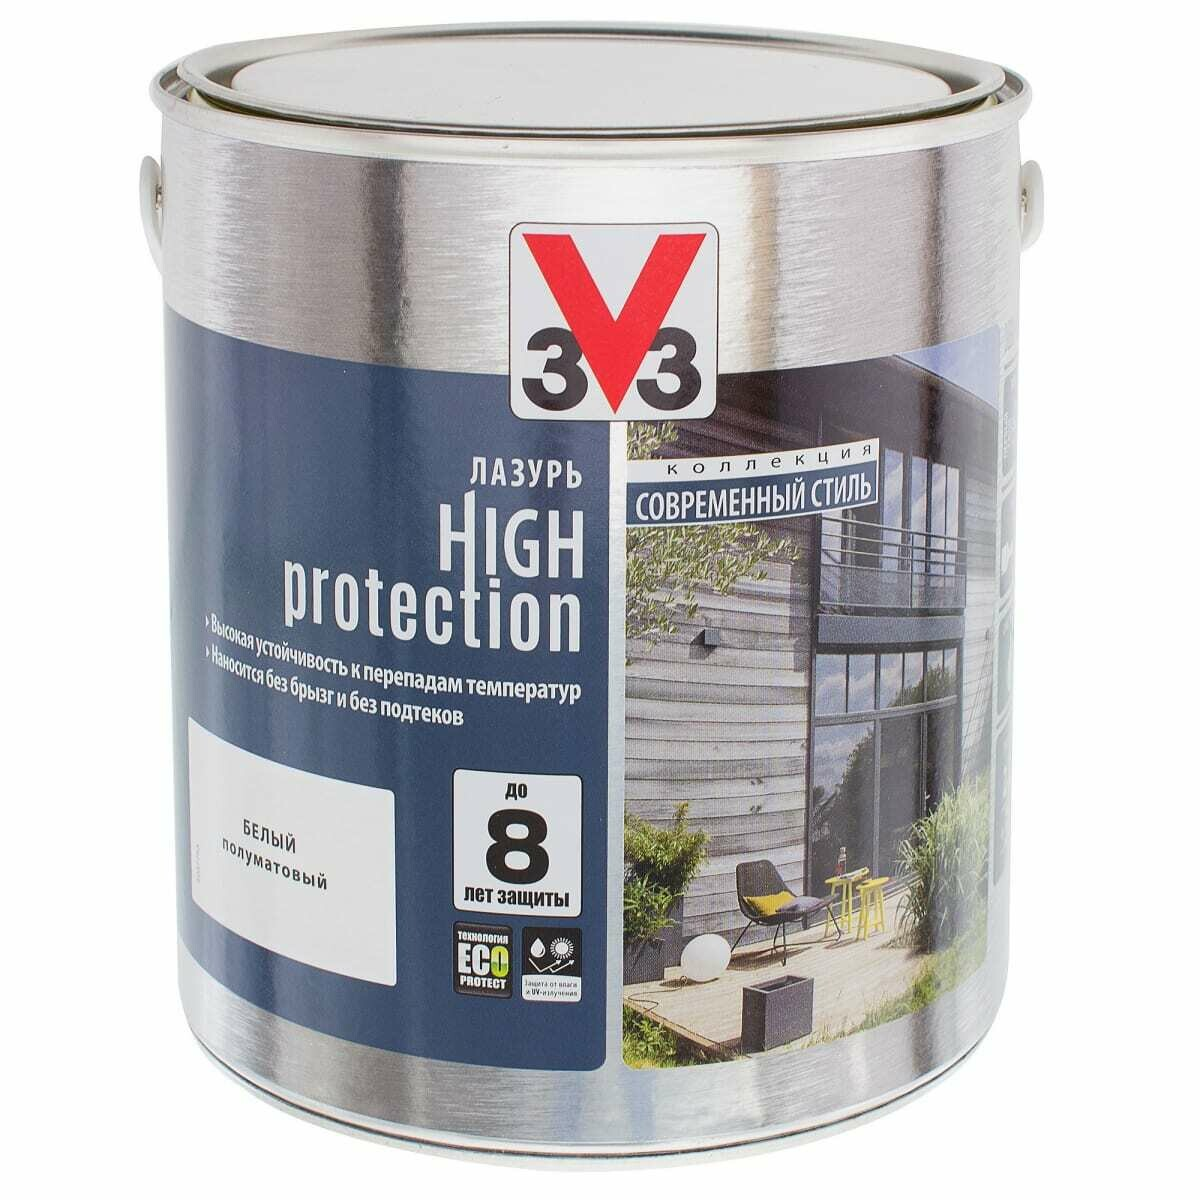 Лазурь Модерн V33 High Protection 2.5 л